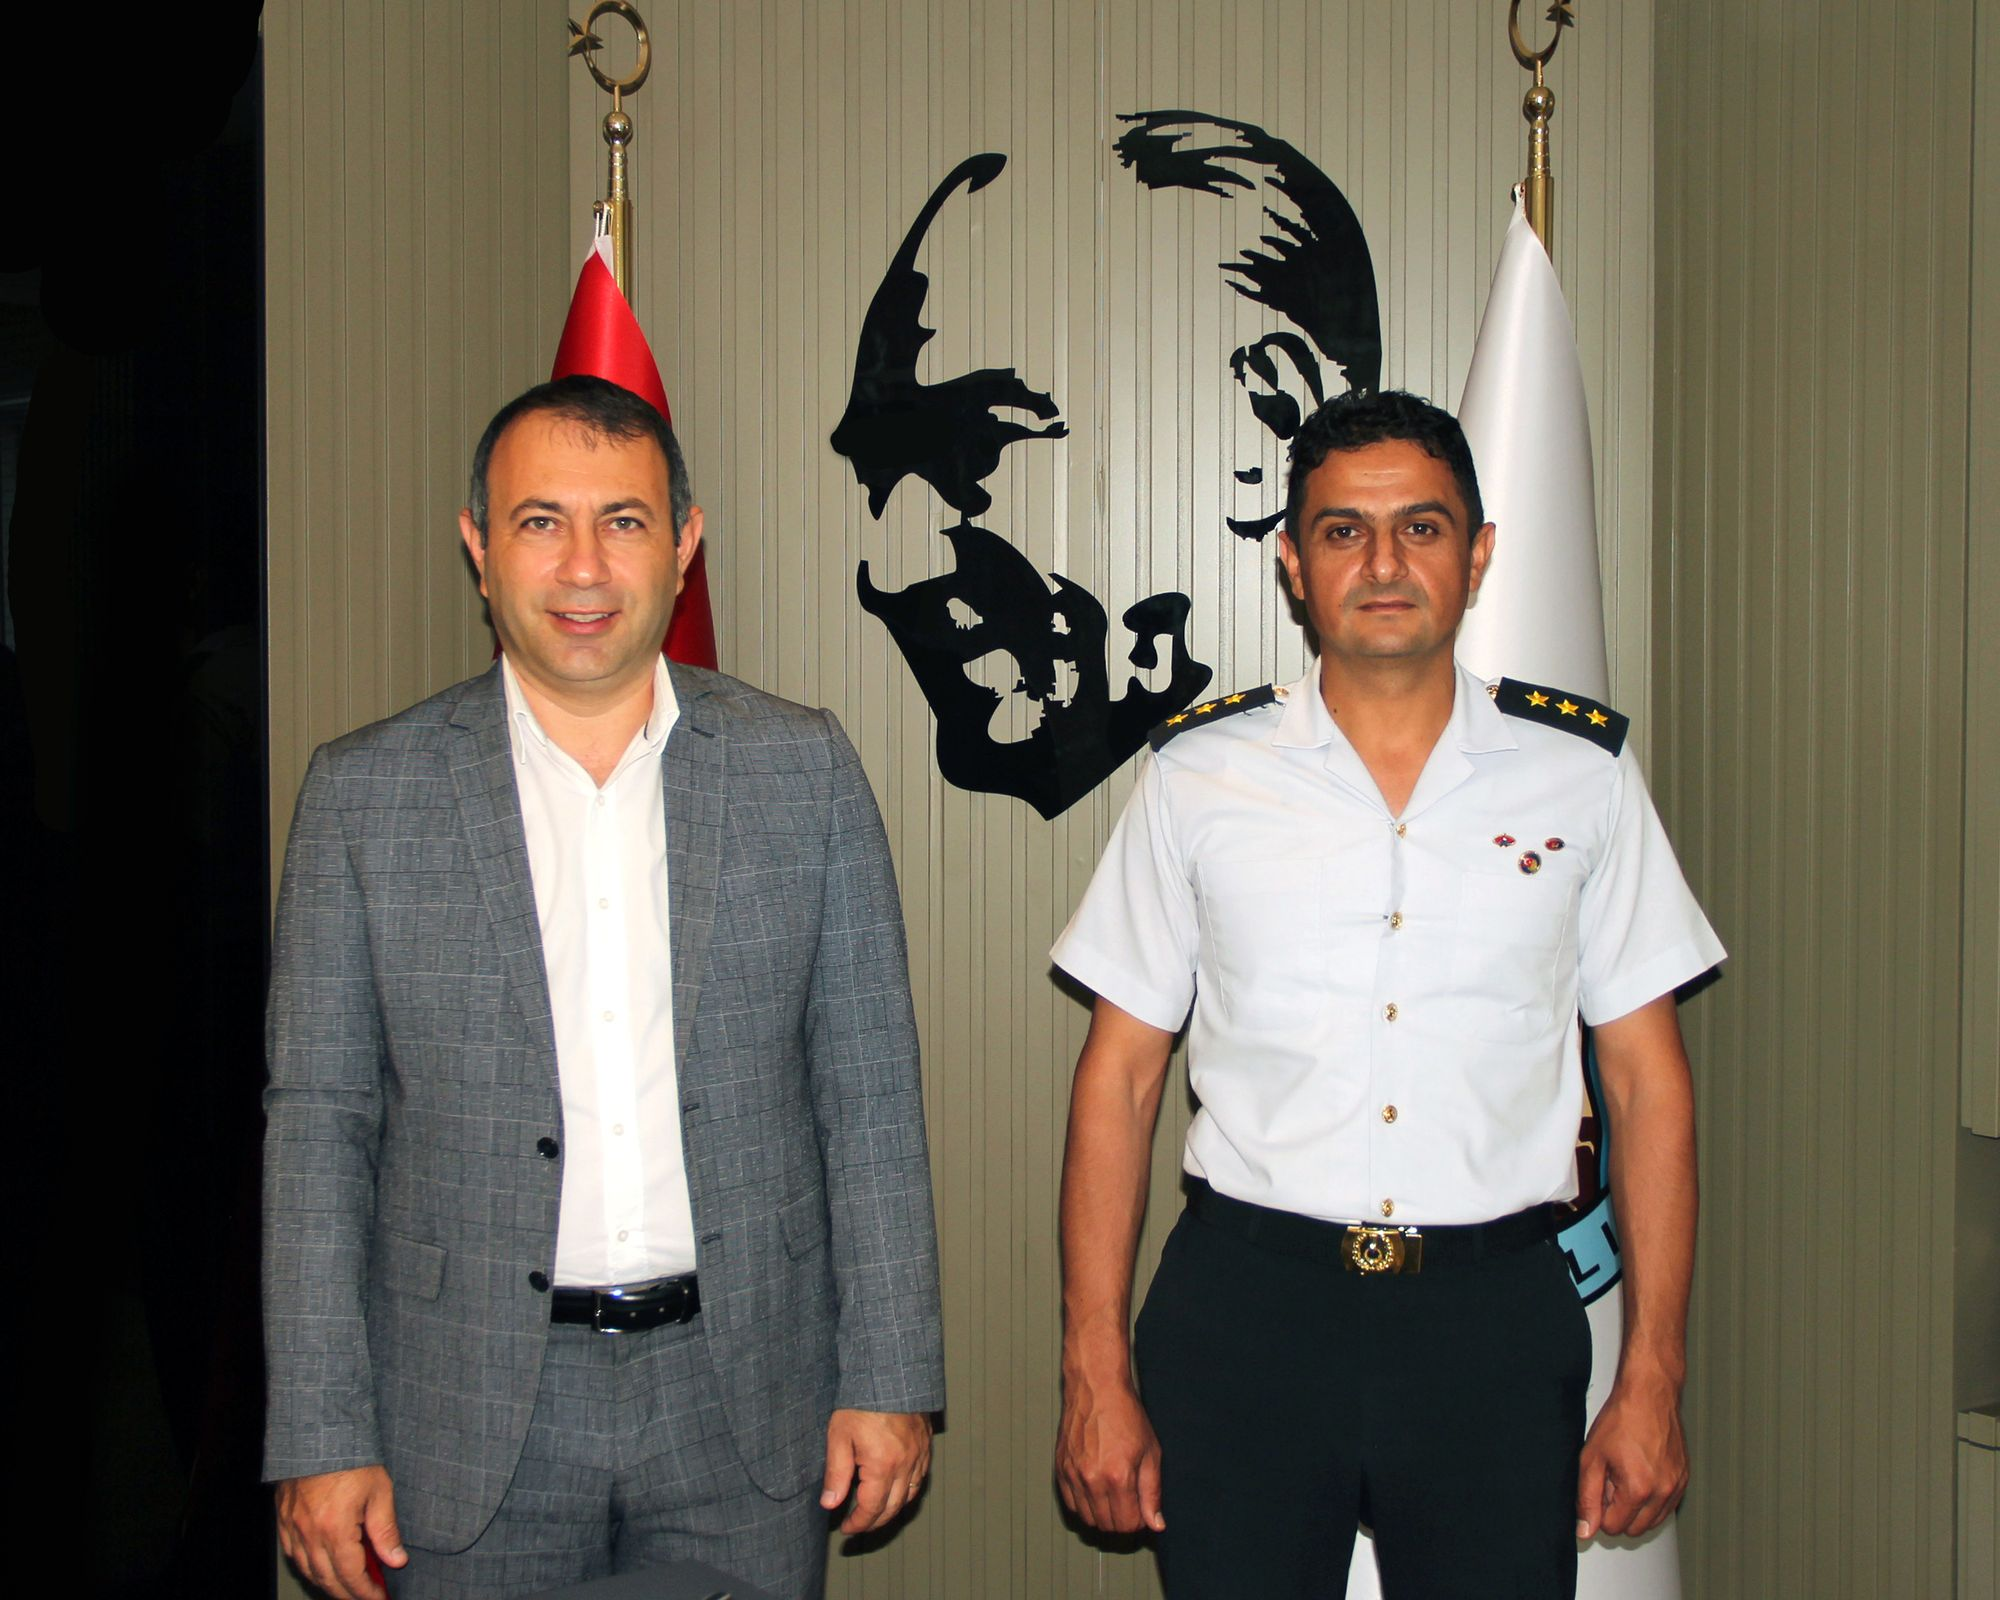 Jandarma KomutanıYüzbaşı Abbas Başer'den Başkan İbaş'a Veda Ziyareti.